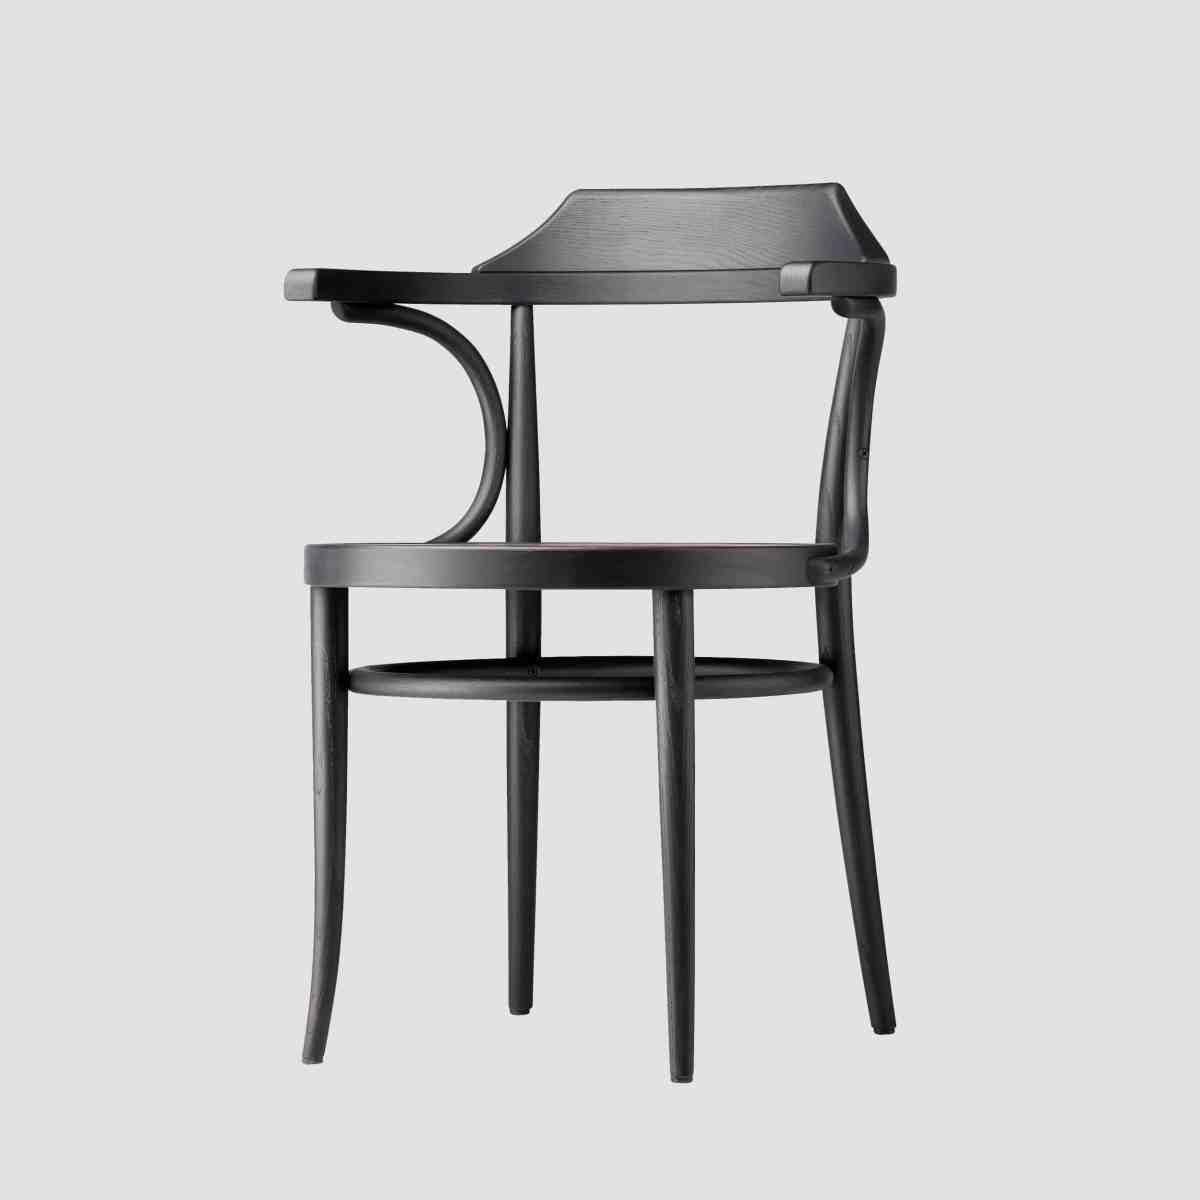 thonet-233-ash-black-chair-side-001